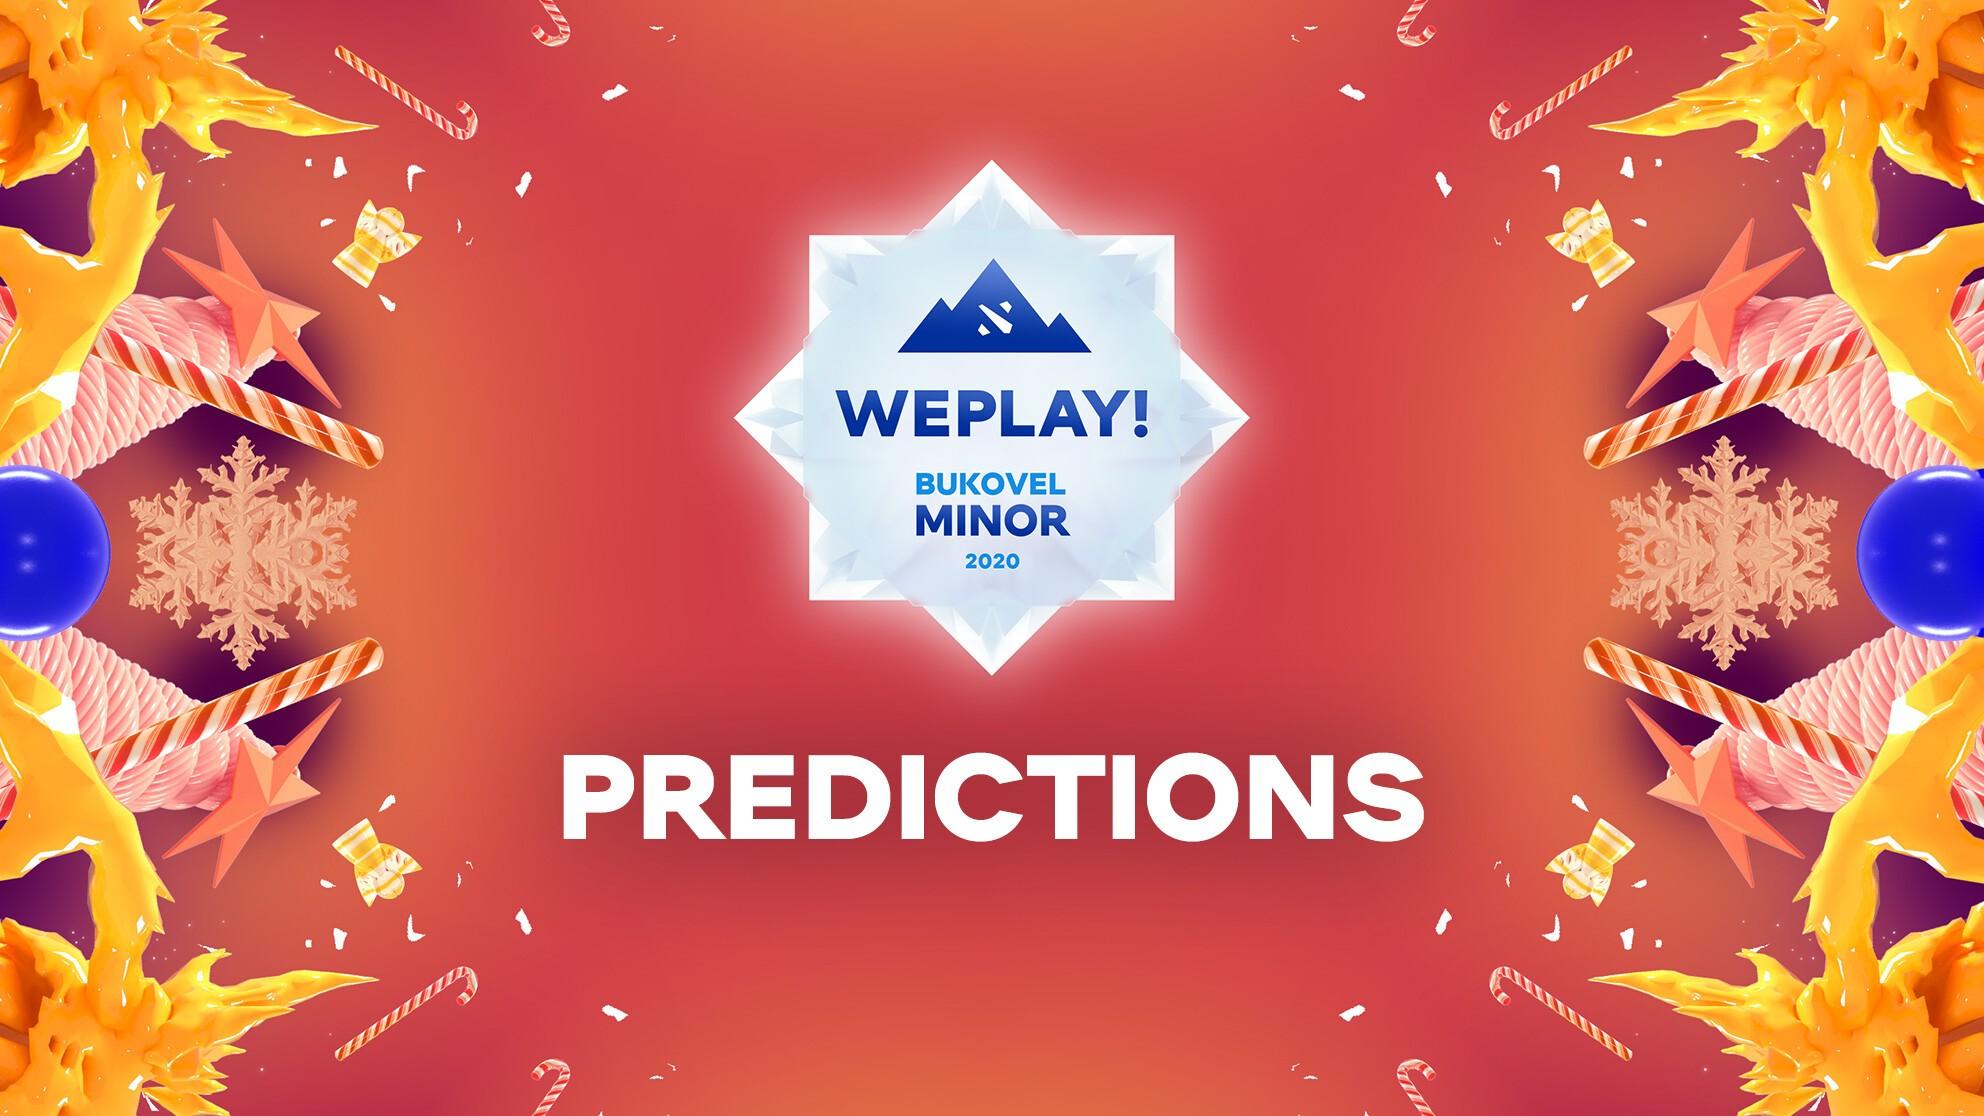 WePlay! Bukovel Minor 2020: Day 1 Predictions